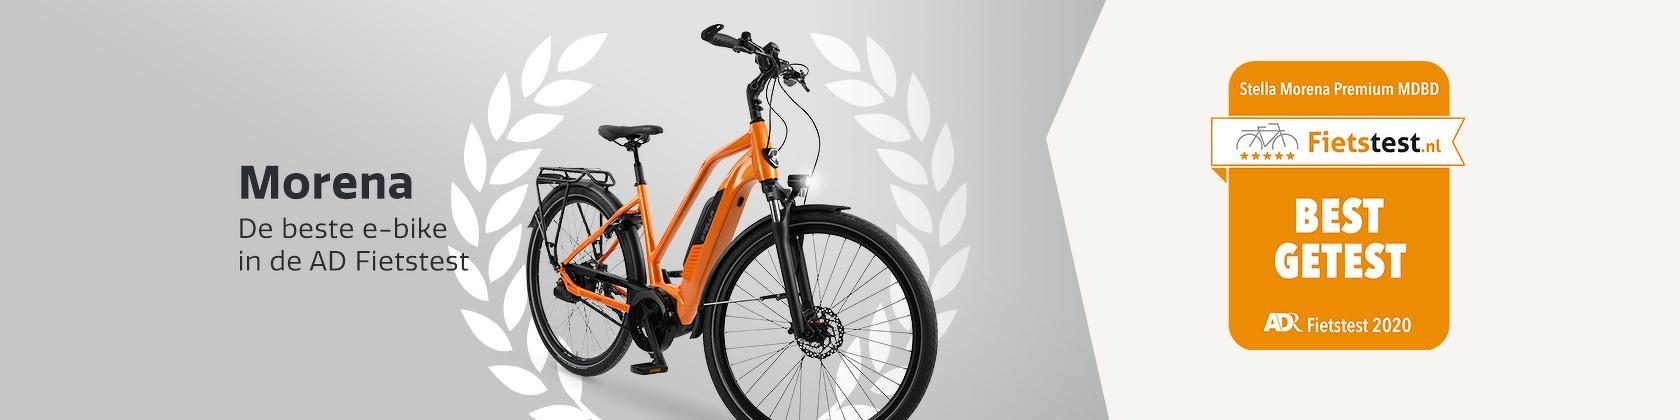 Stella Morena - De beste e-bike in de AD fietstest